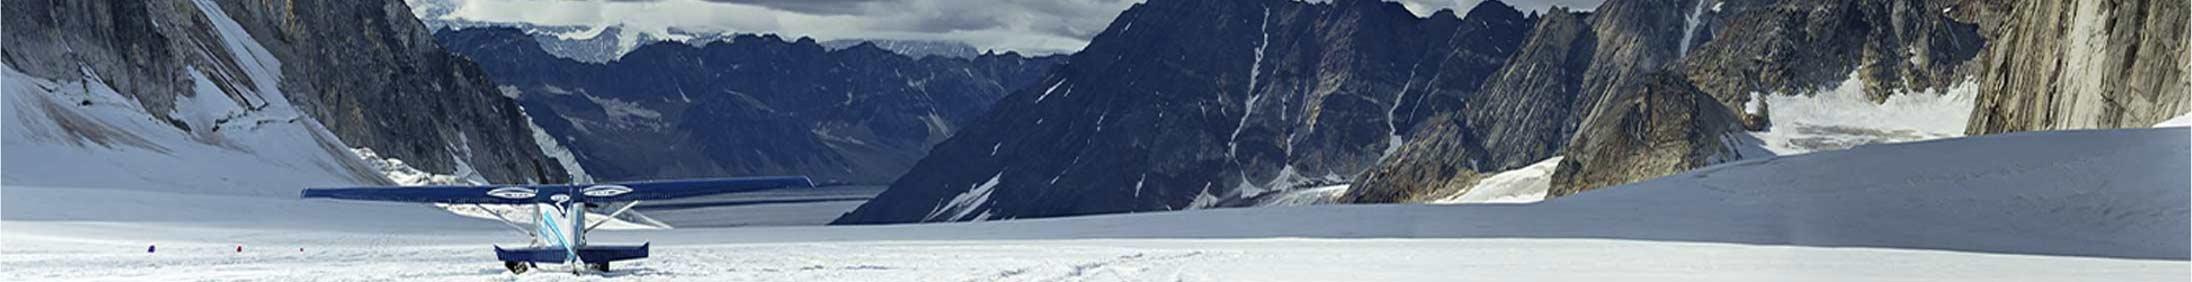 Small plane landed on an Alaskan glacier